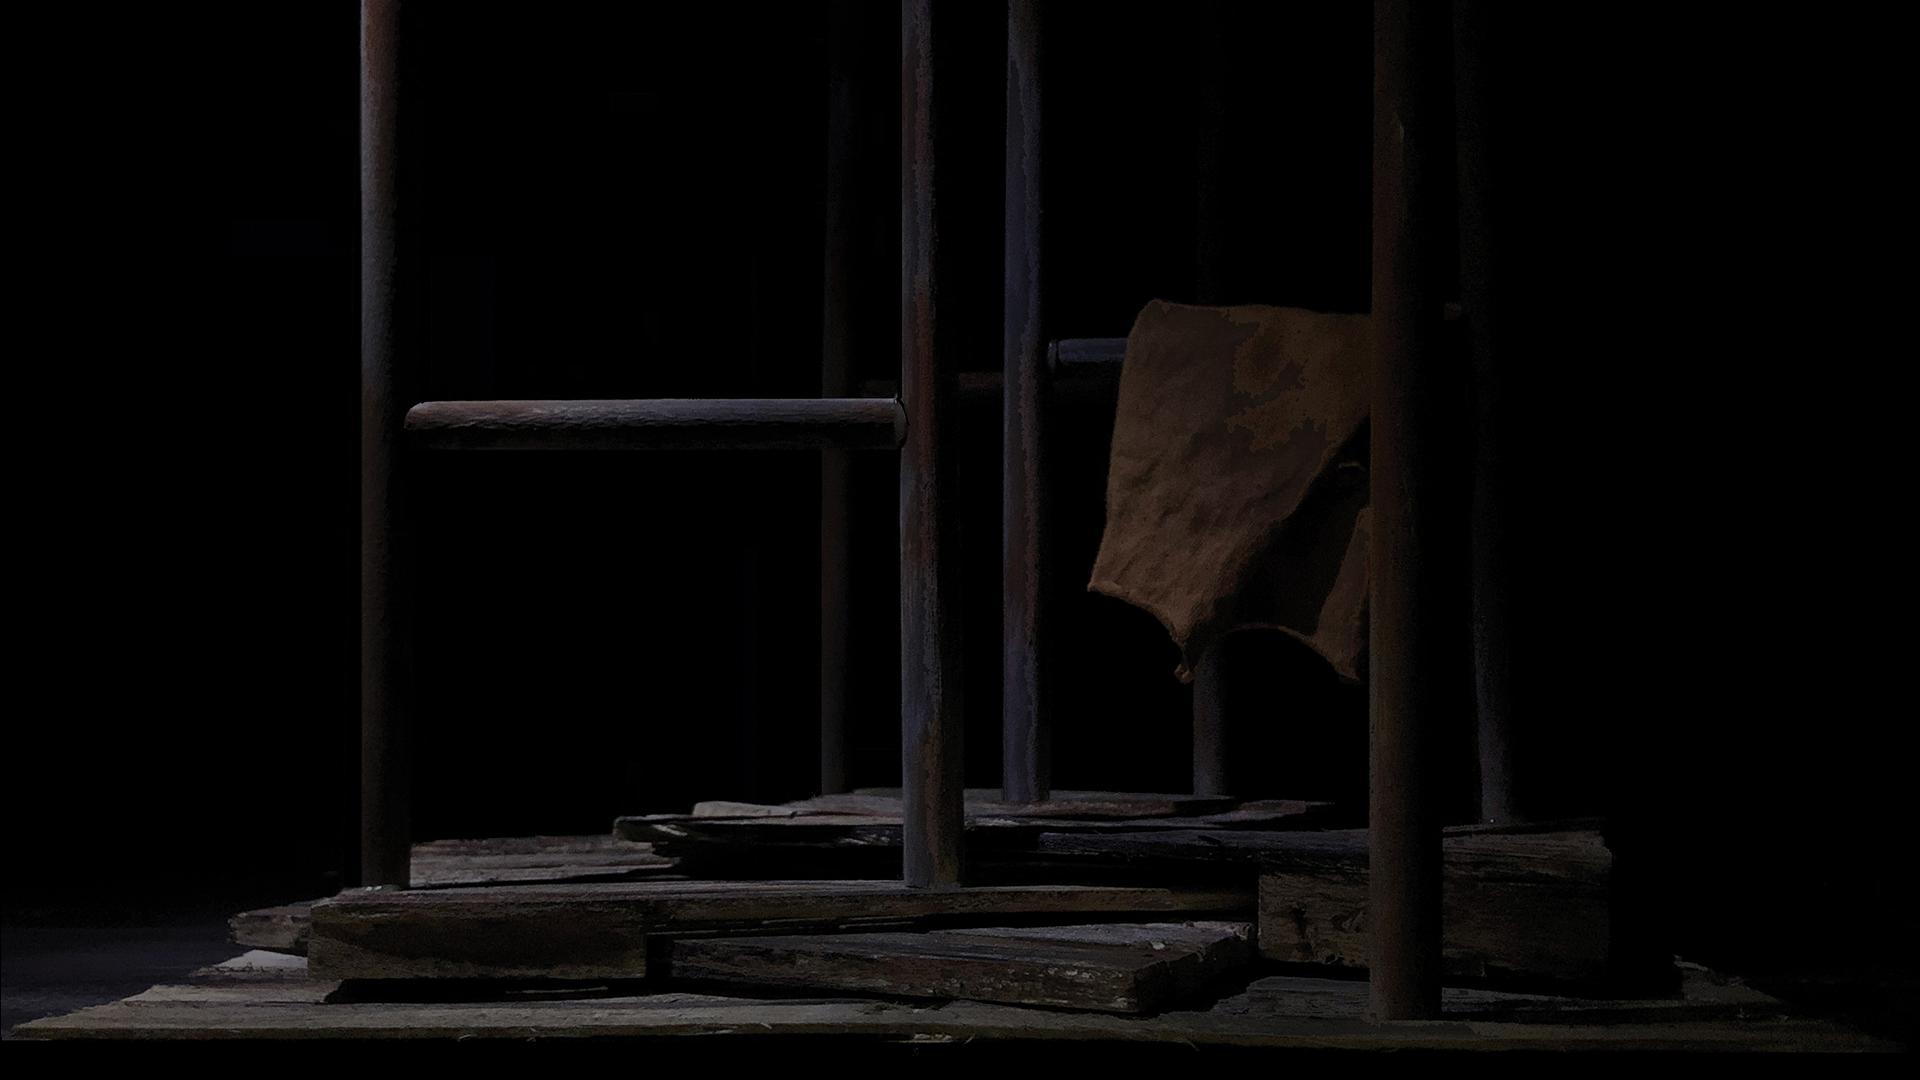 Giorgia Labate, Hamletmaschine 2019